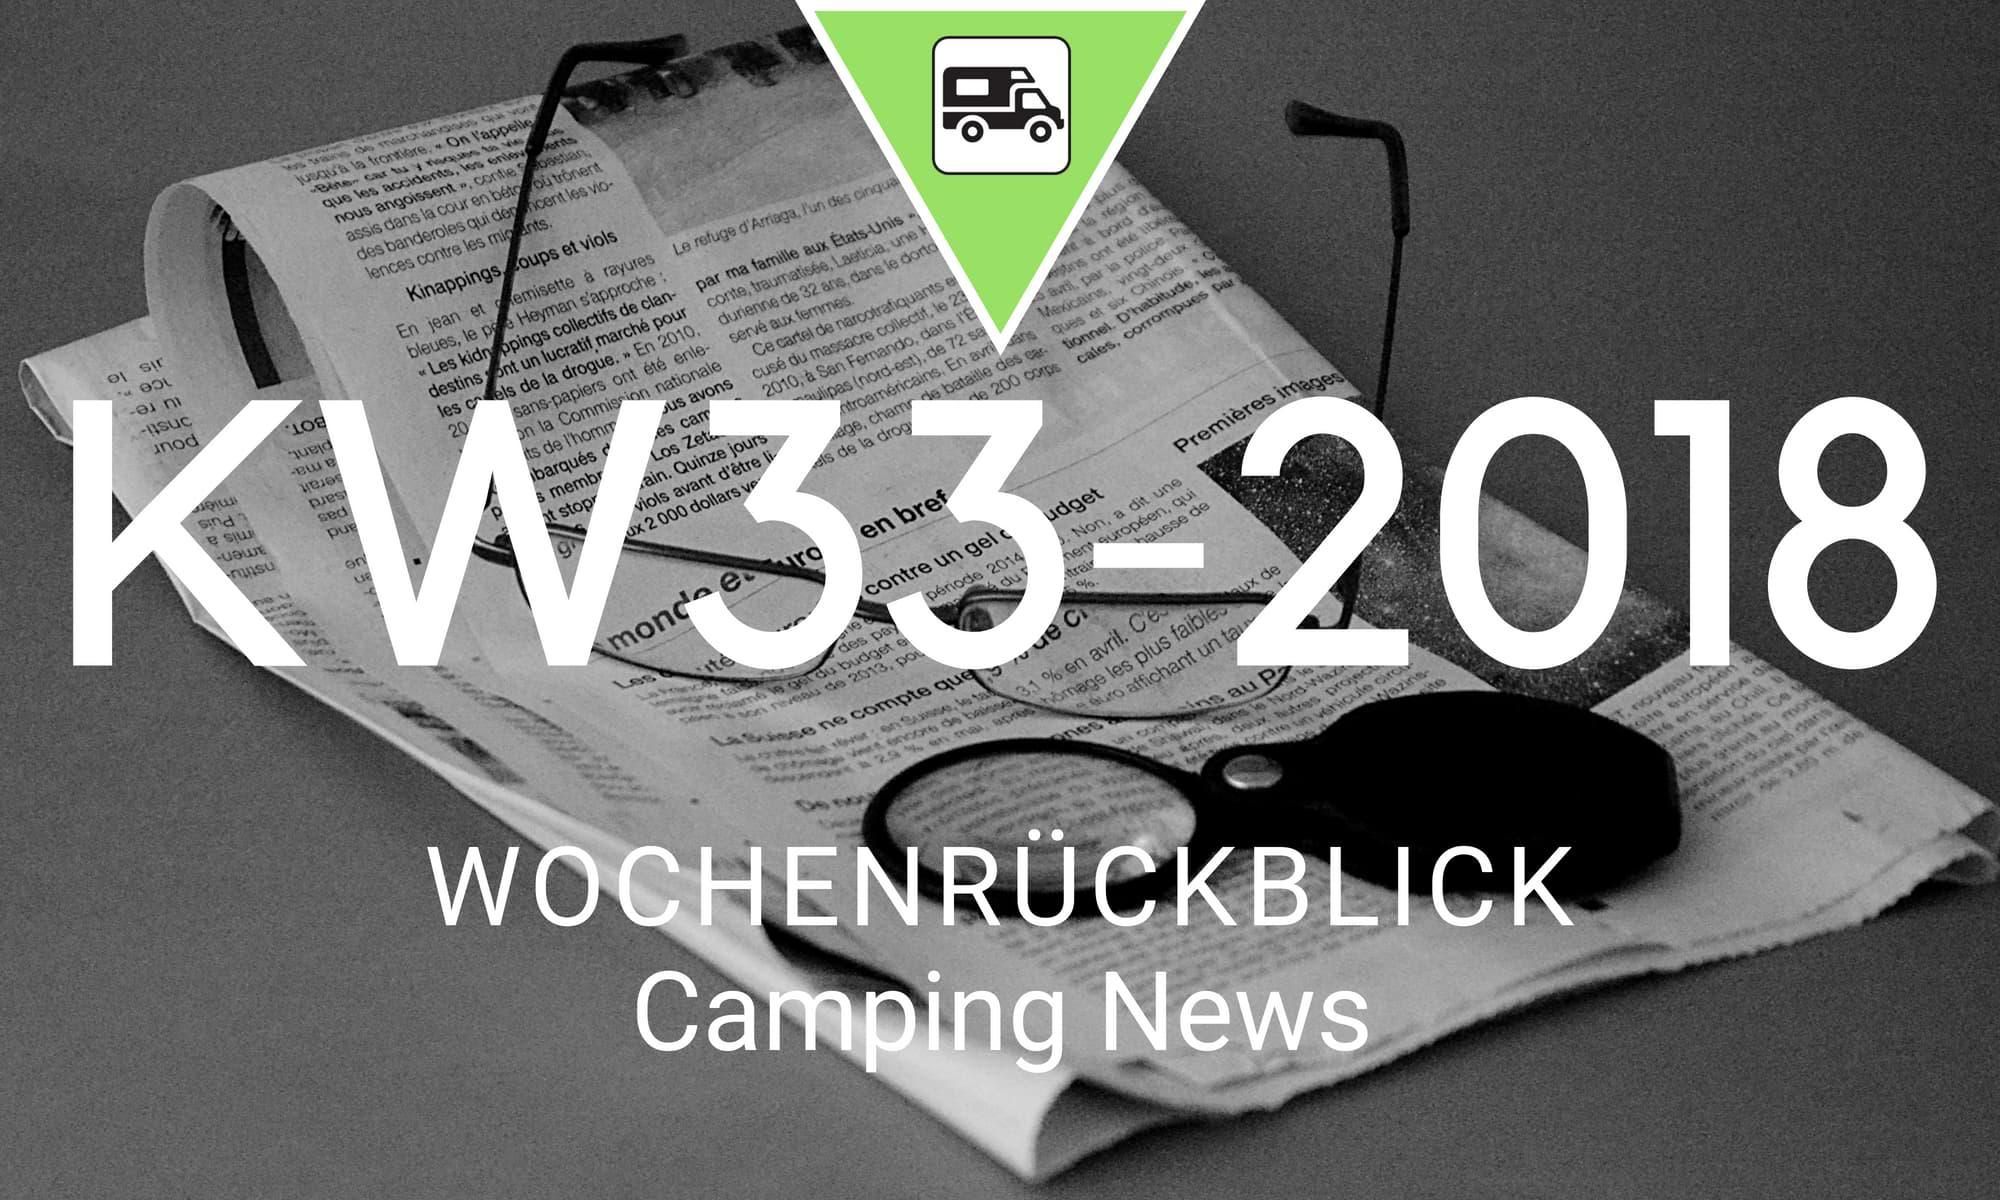 Wochenrückblick Camping News KW33-2018